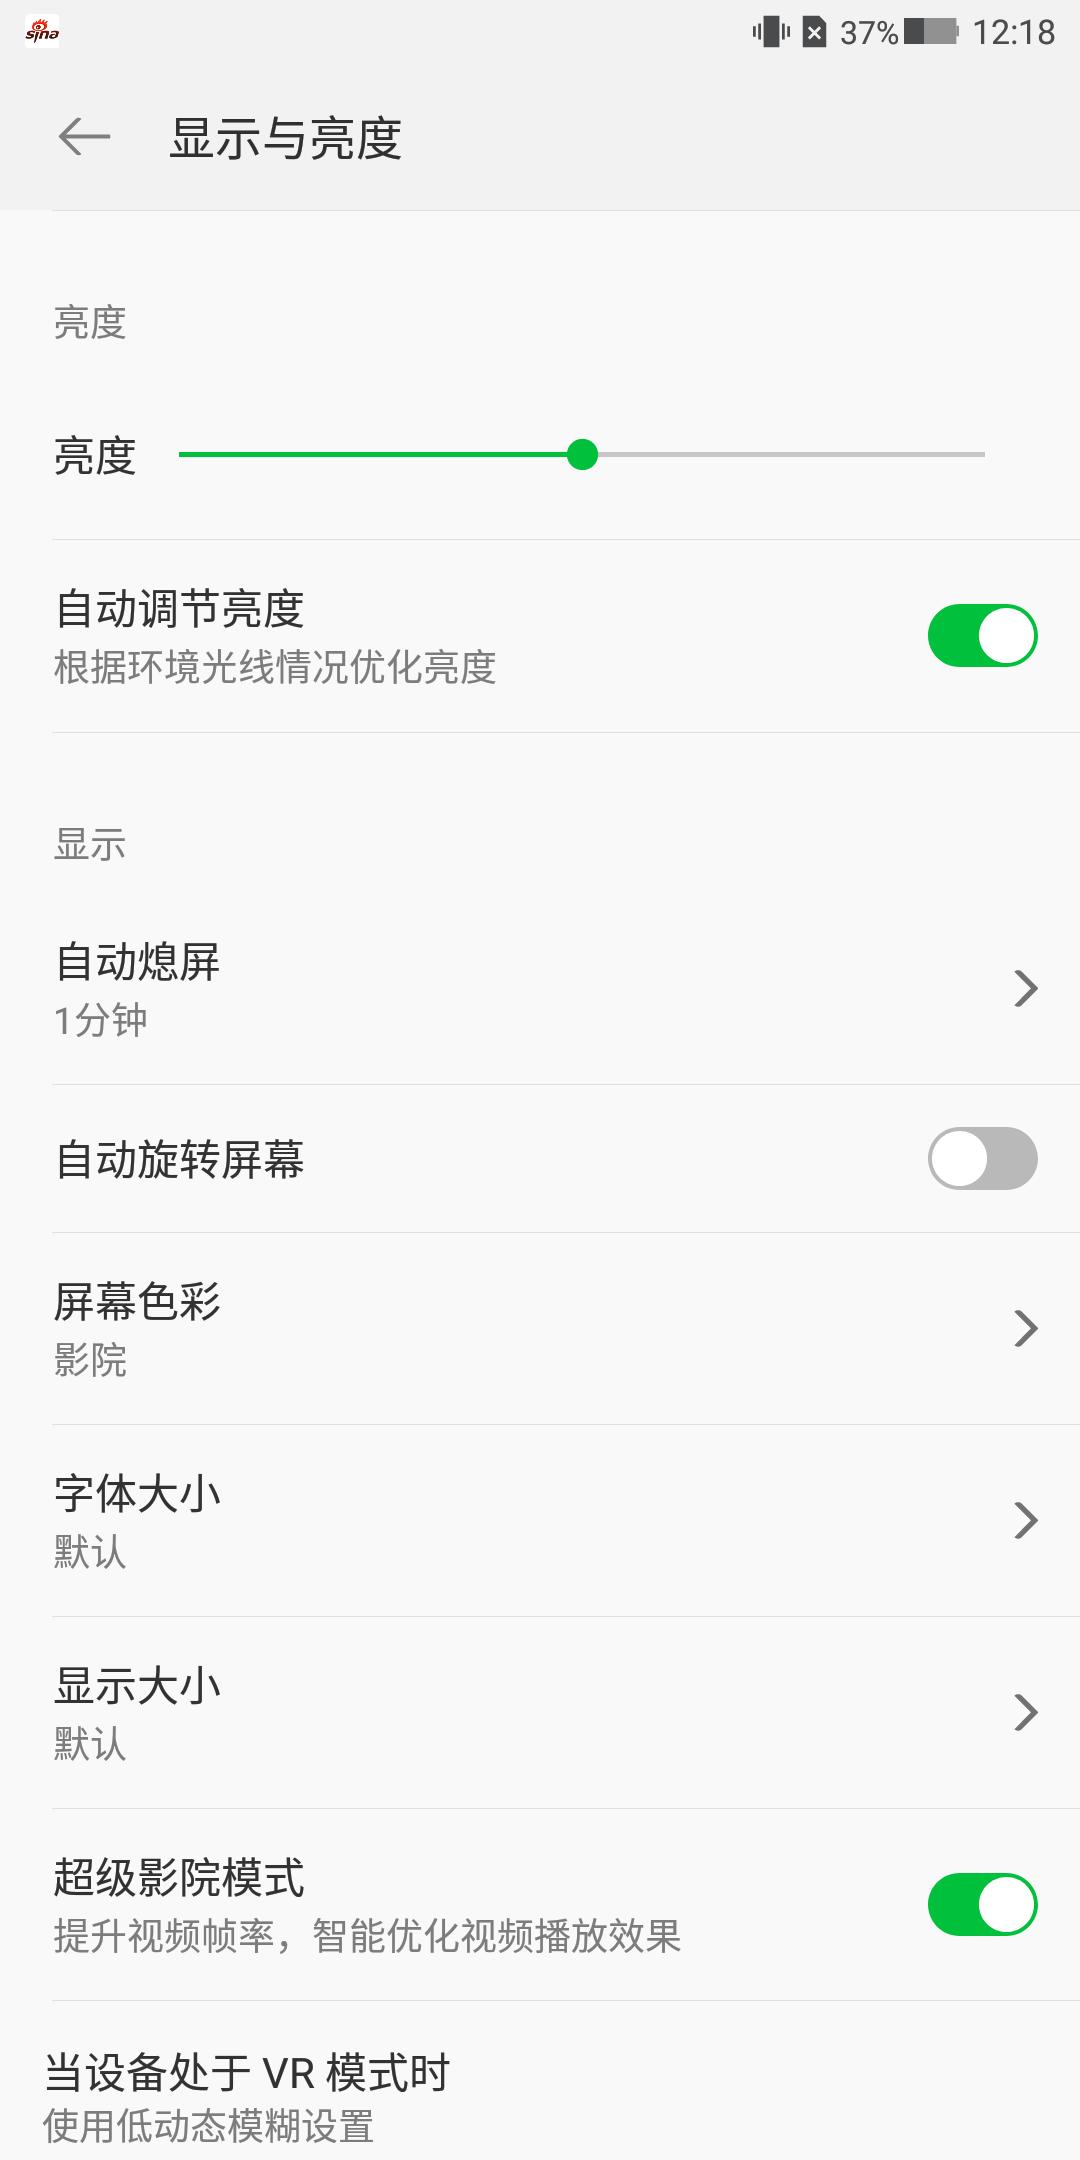 Screenshot_2018-04-27-12-18-16-913_com.android.se.png